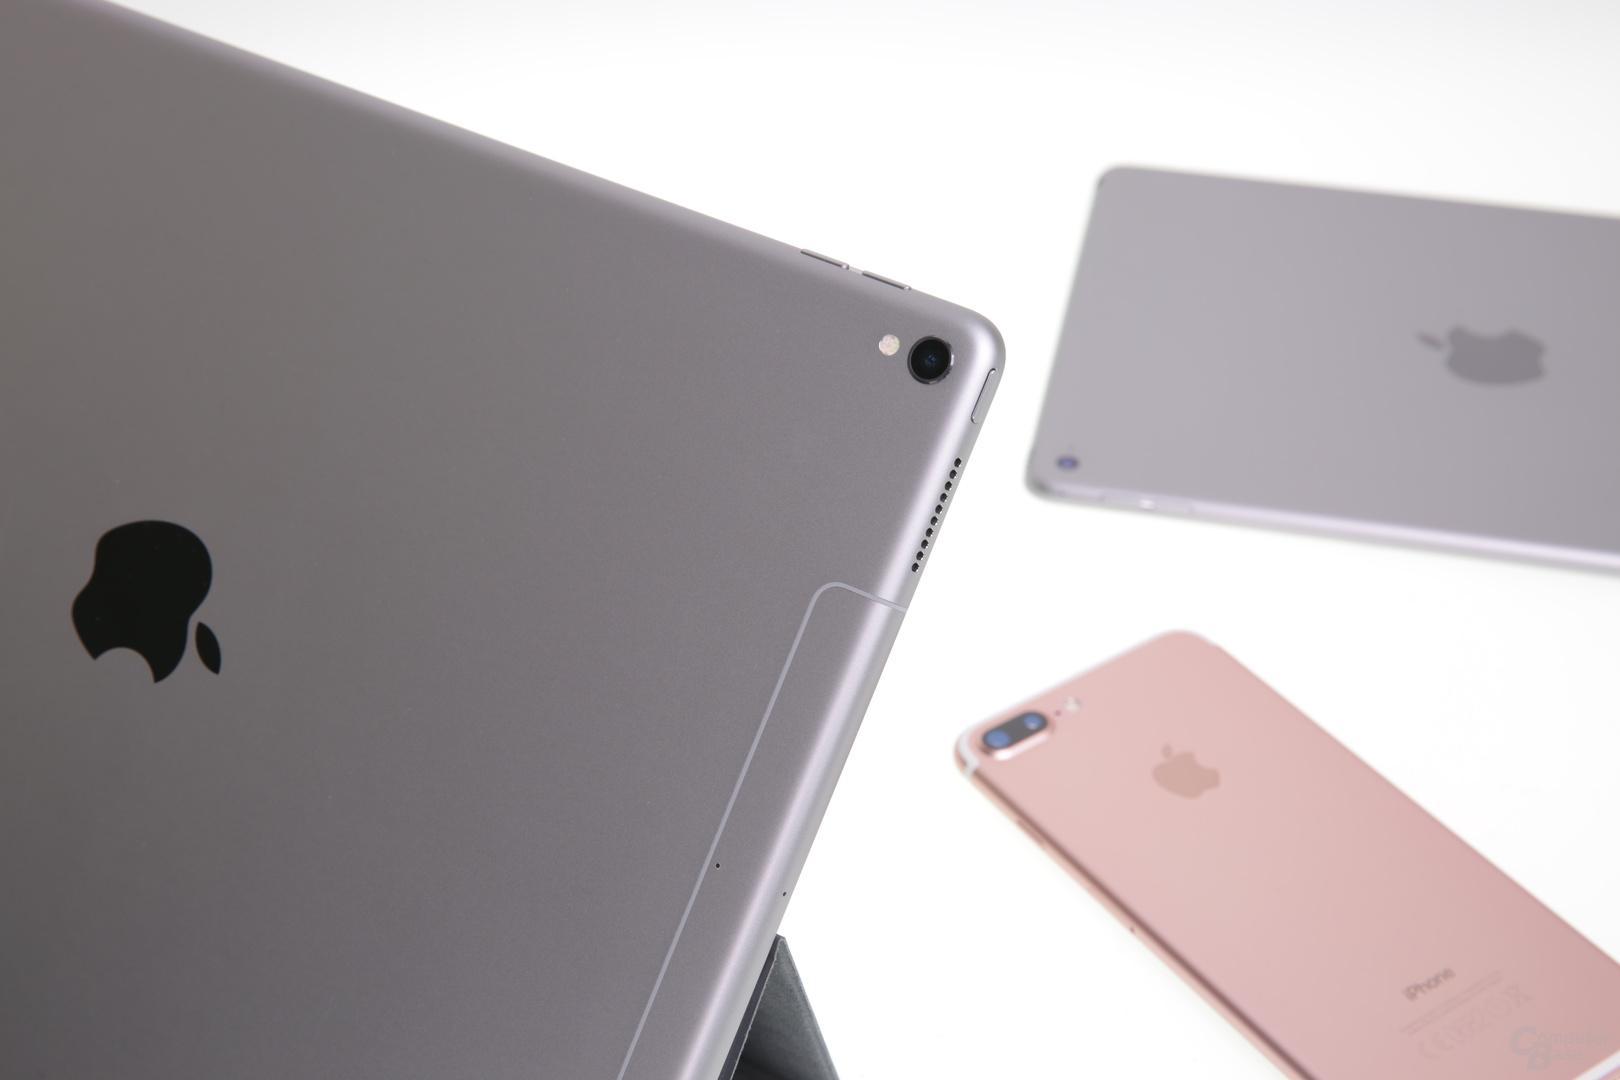 Kamera des iPhone 7